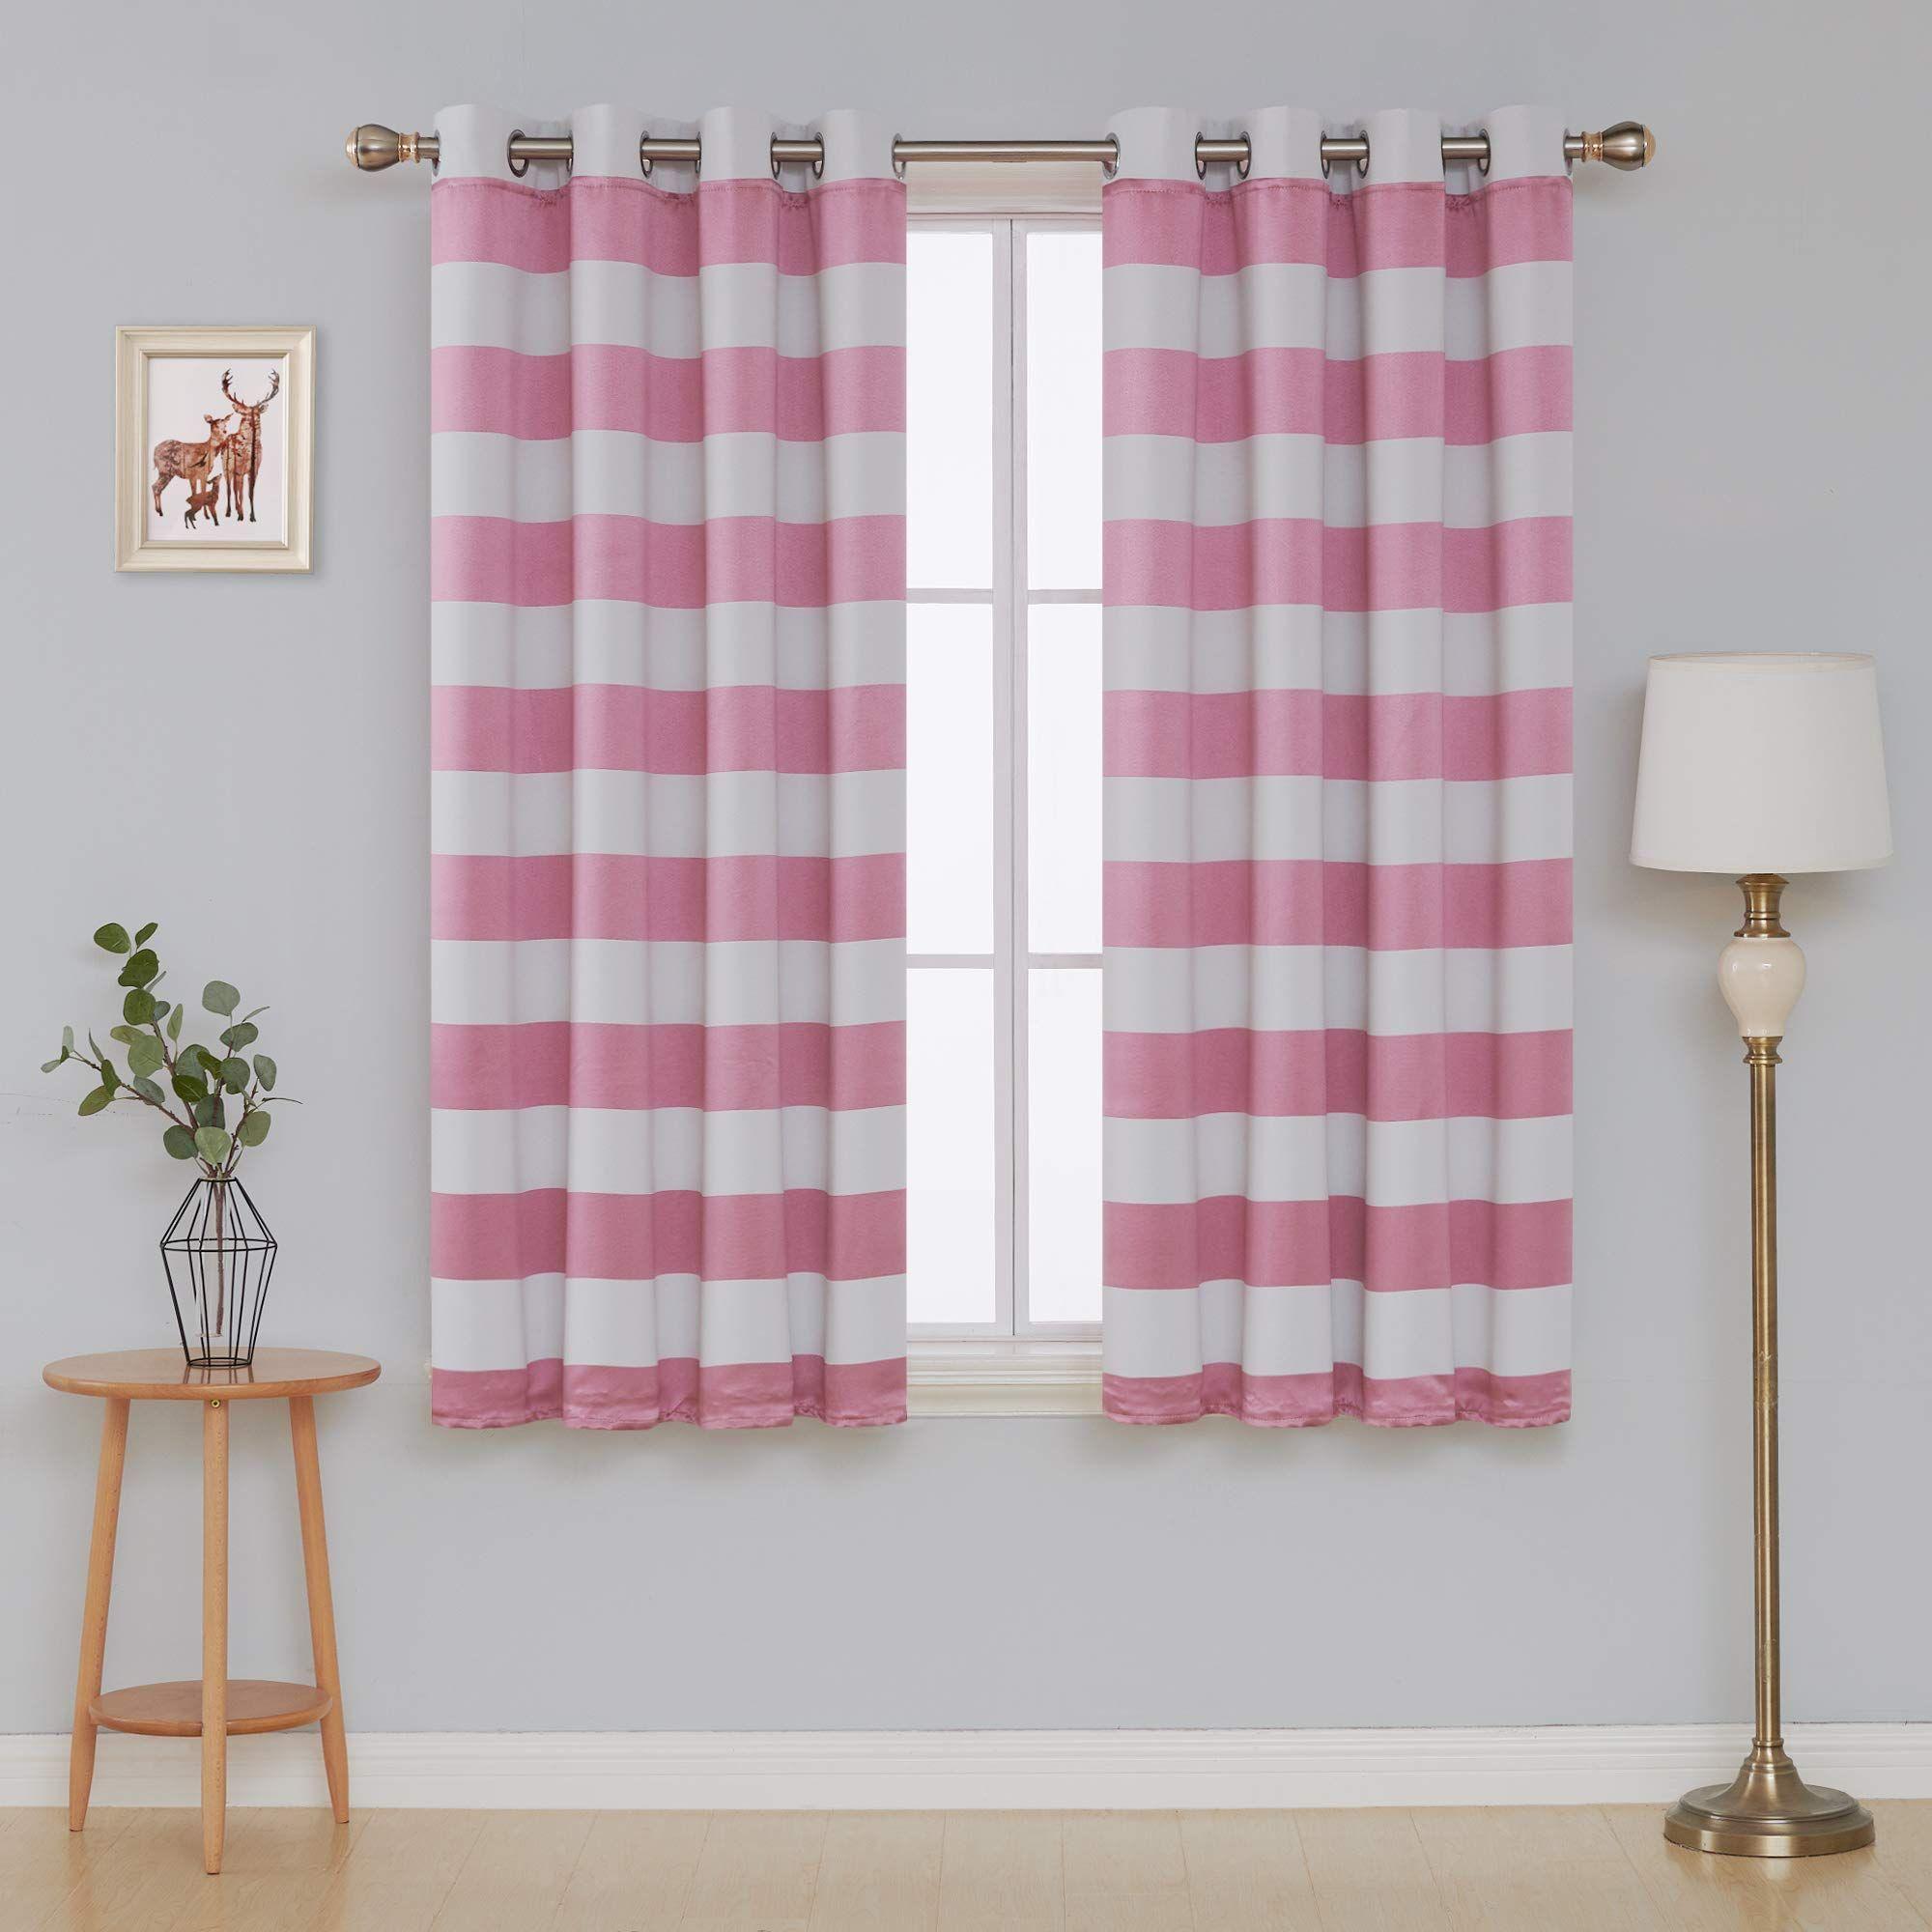 Deconovo Pink Striped Room Darkening Window Curtains Thermal